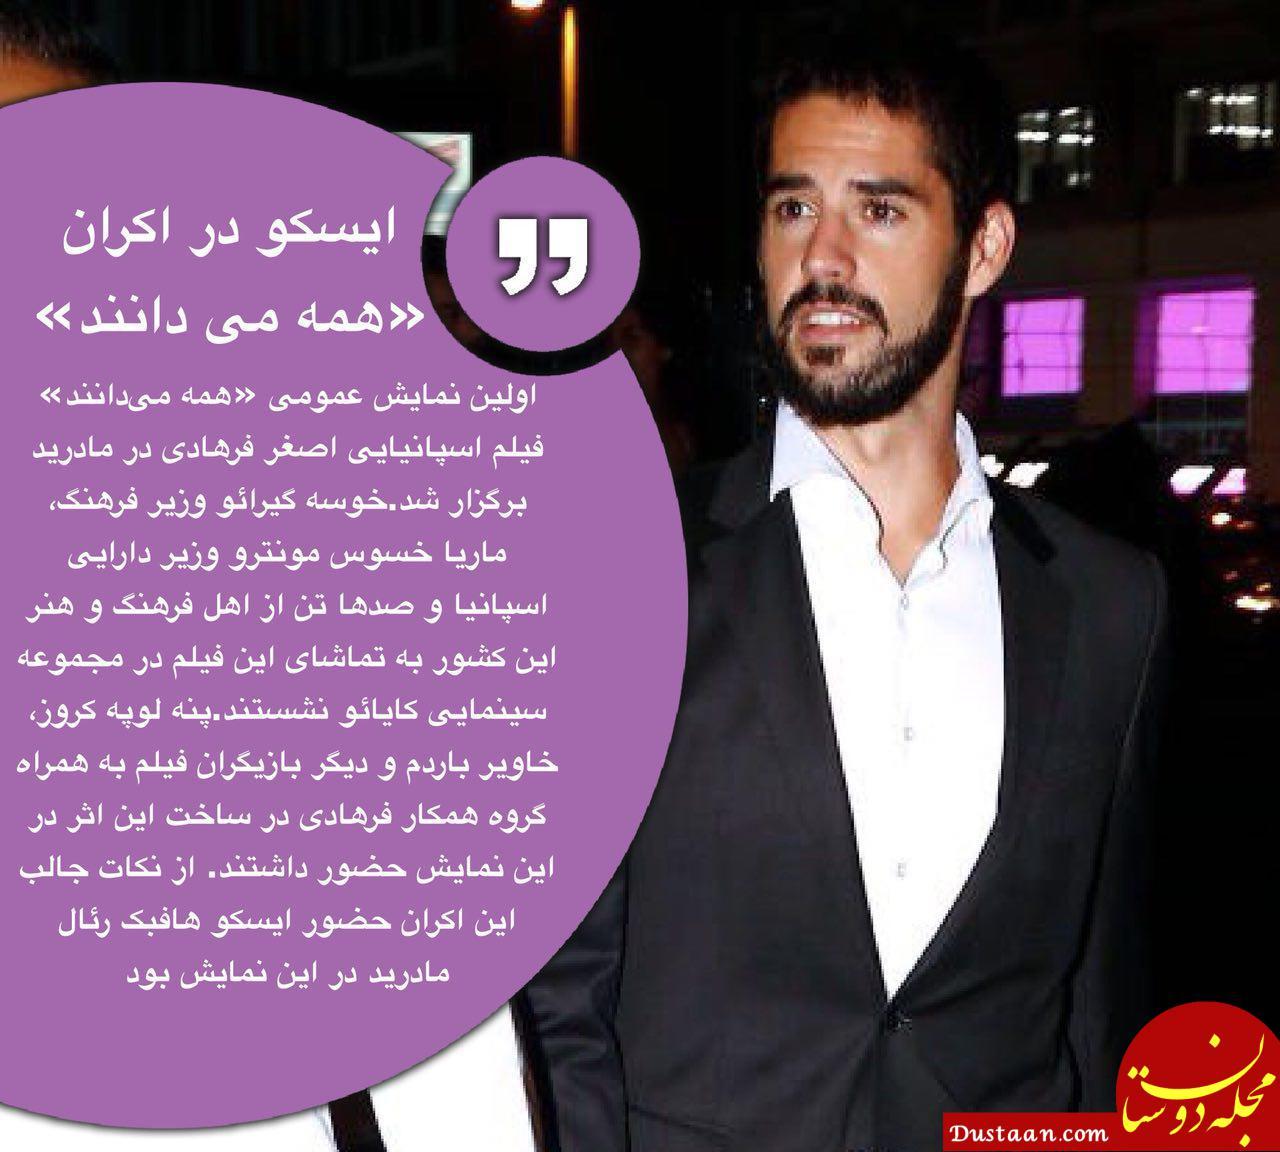 www.dustaan.com حضور ایسکو هافبک رئال مادرید در افتتاحیه فیلم اصغر فرهادی! +عکس